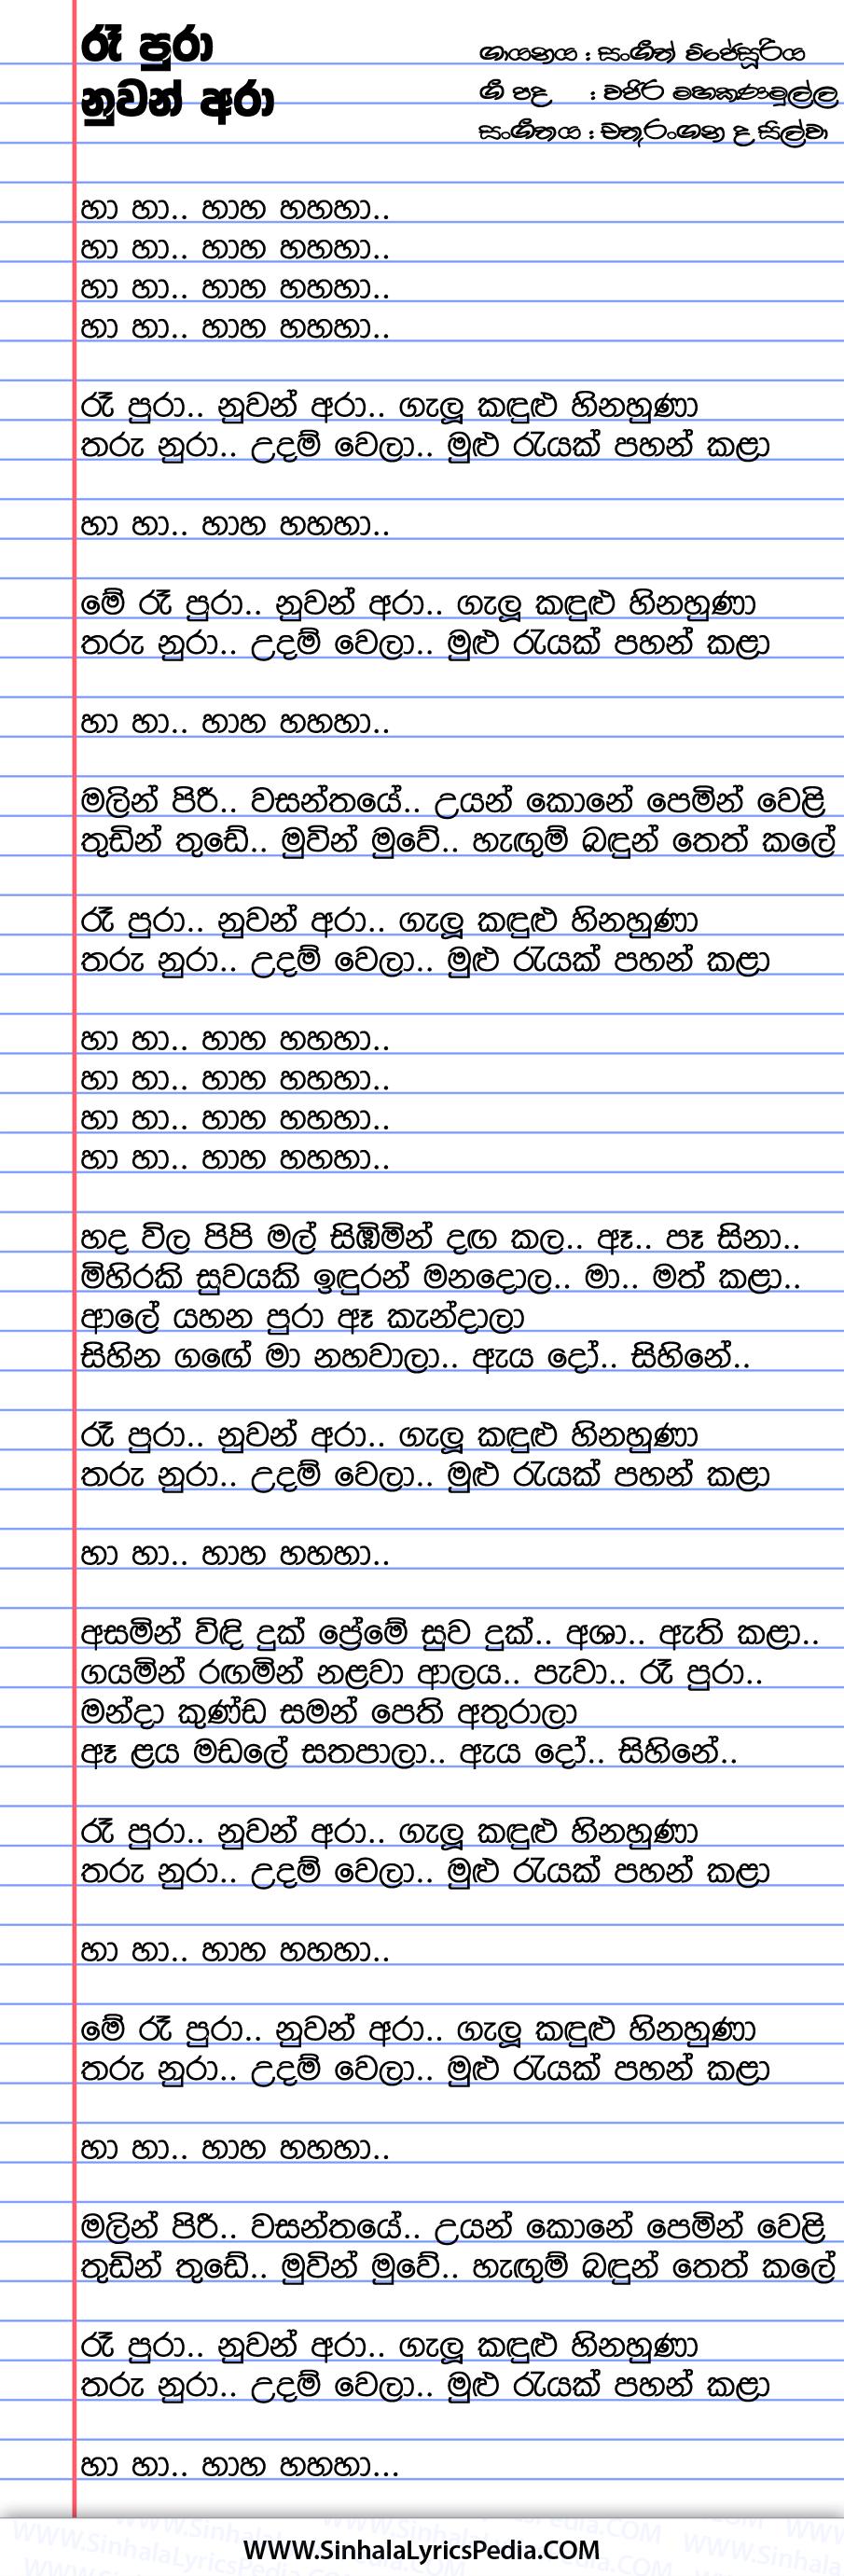 Ra Pura Nuwan Ara Song Lyrics